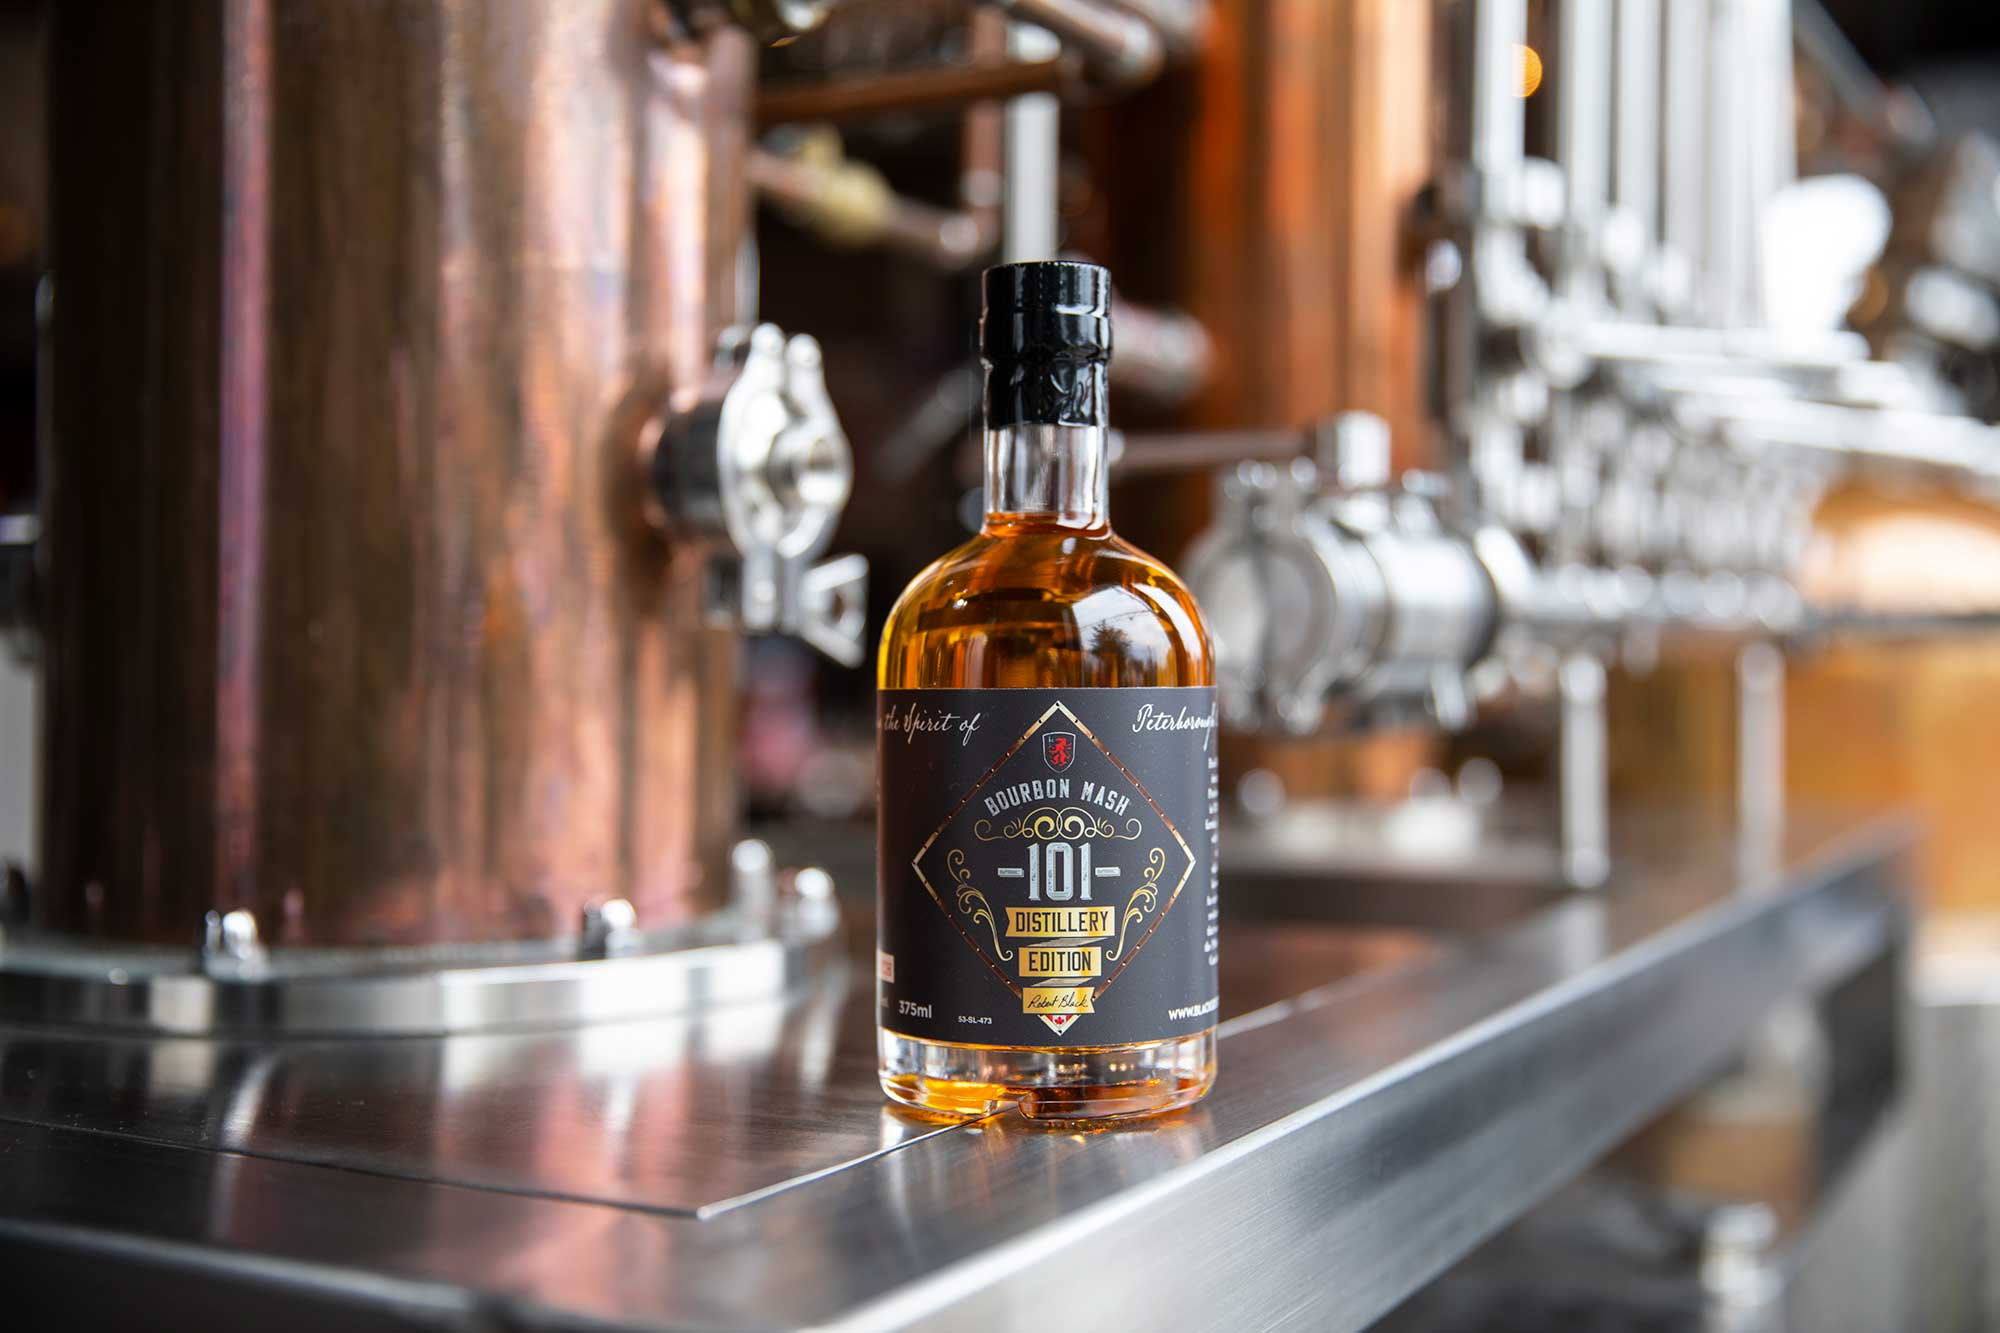 Black's Distillery Bourbon